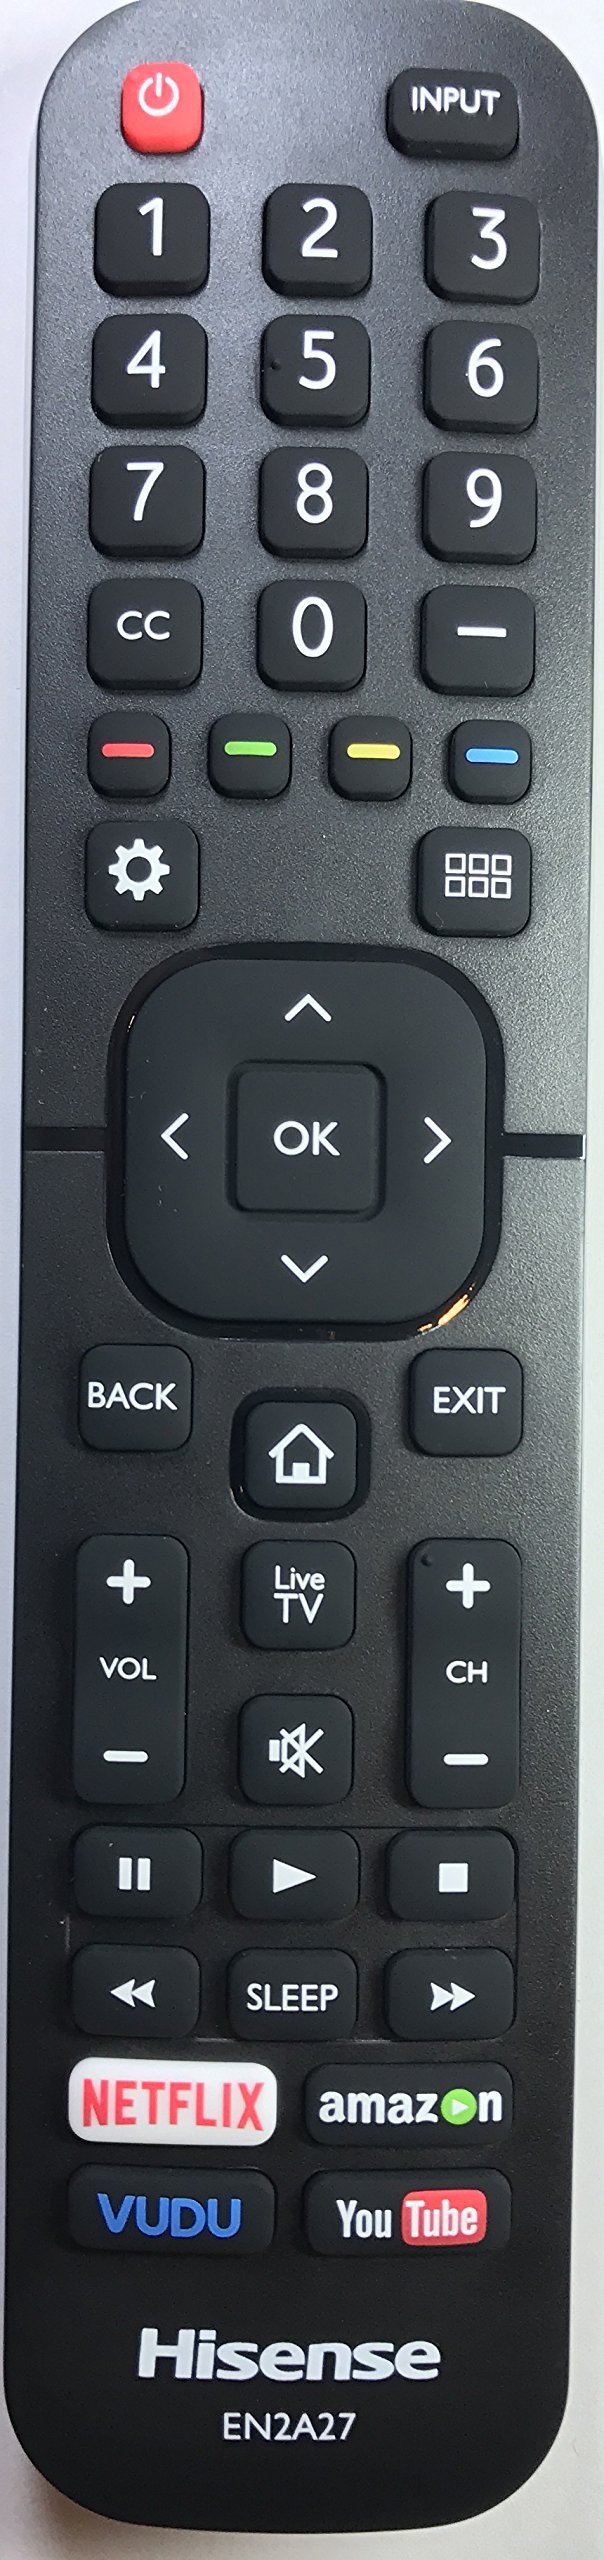 New USARMT EN2A27 (Year 2016) Remote for Hisense H5 Series FHD Smart TV Models Hisense 40H5B 43H5C 50H5C 55H5C